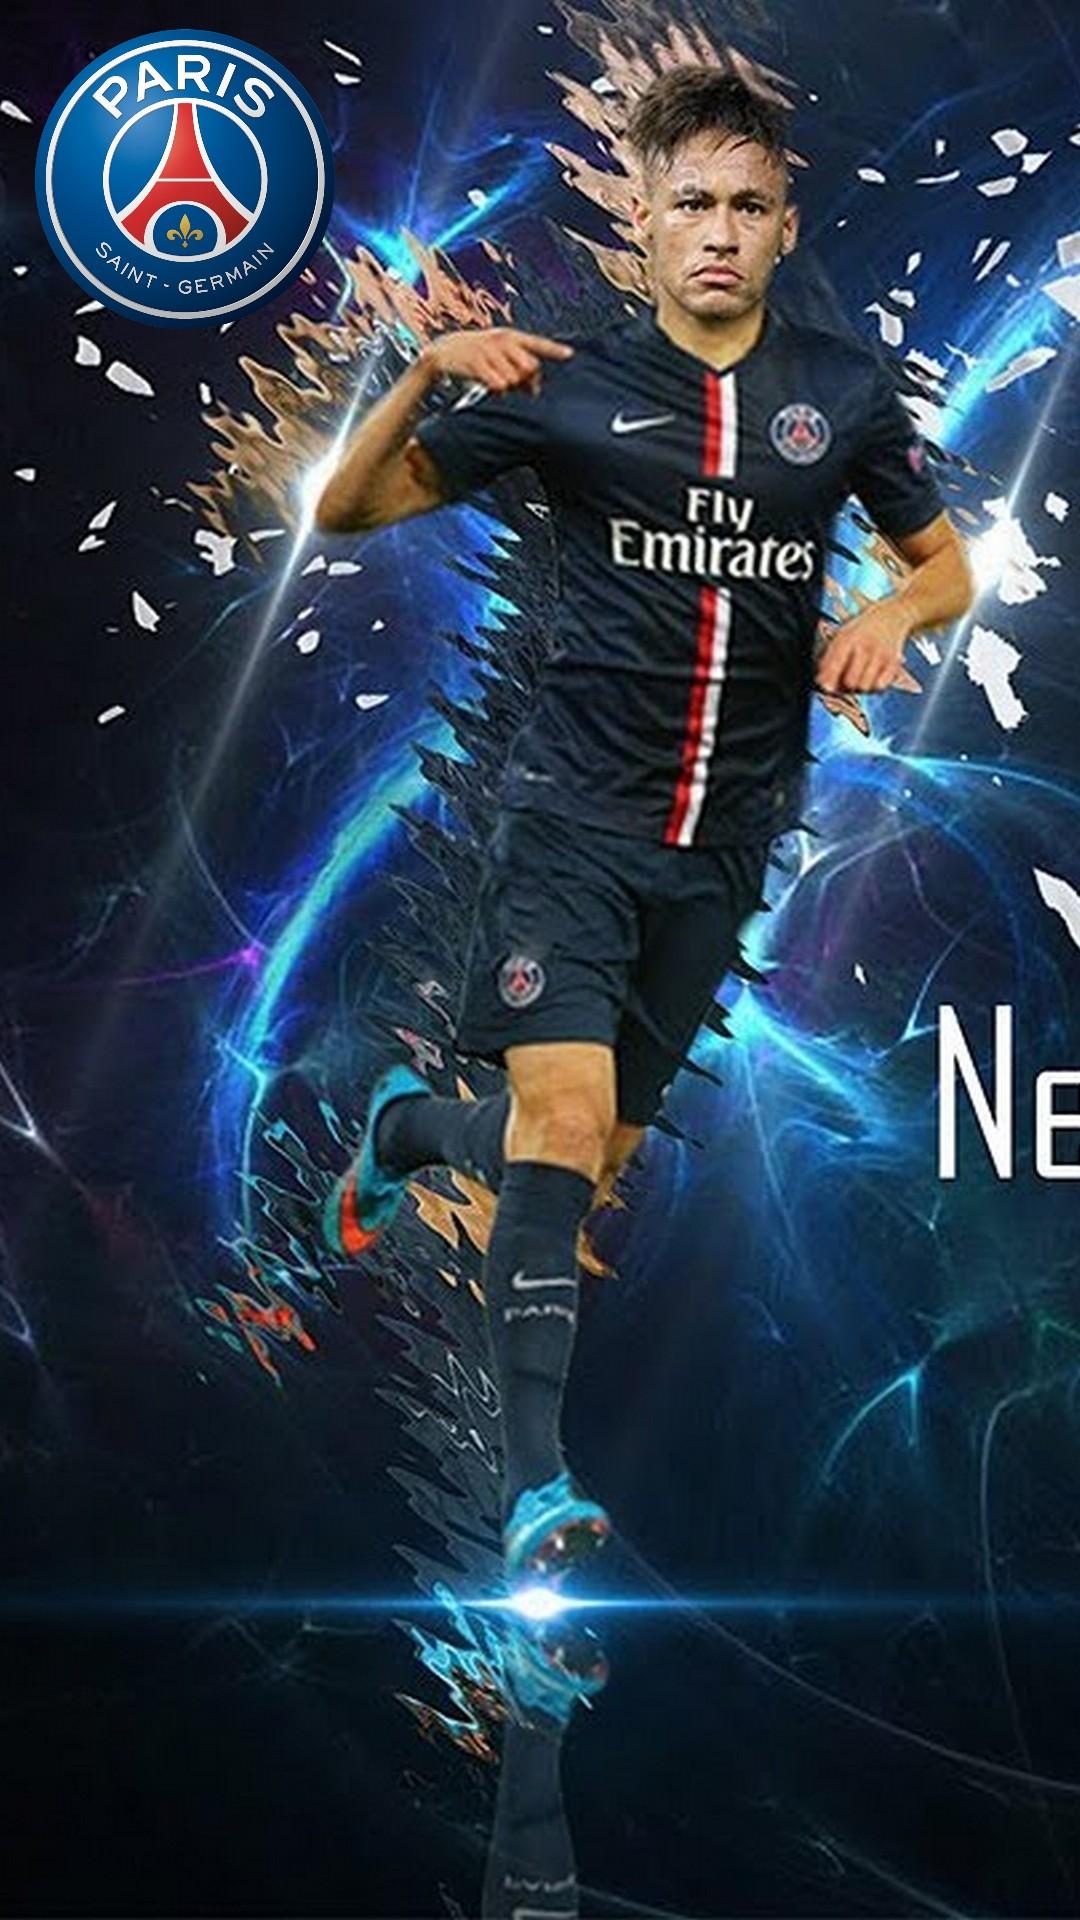 Neymar PSG iPhone 8 Wallpaper 2019 Football Wallpaper 1080x1920